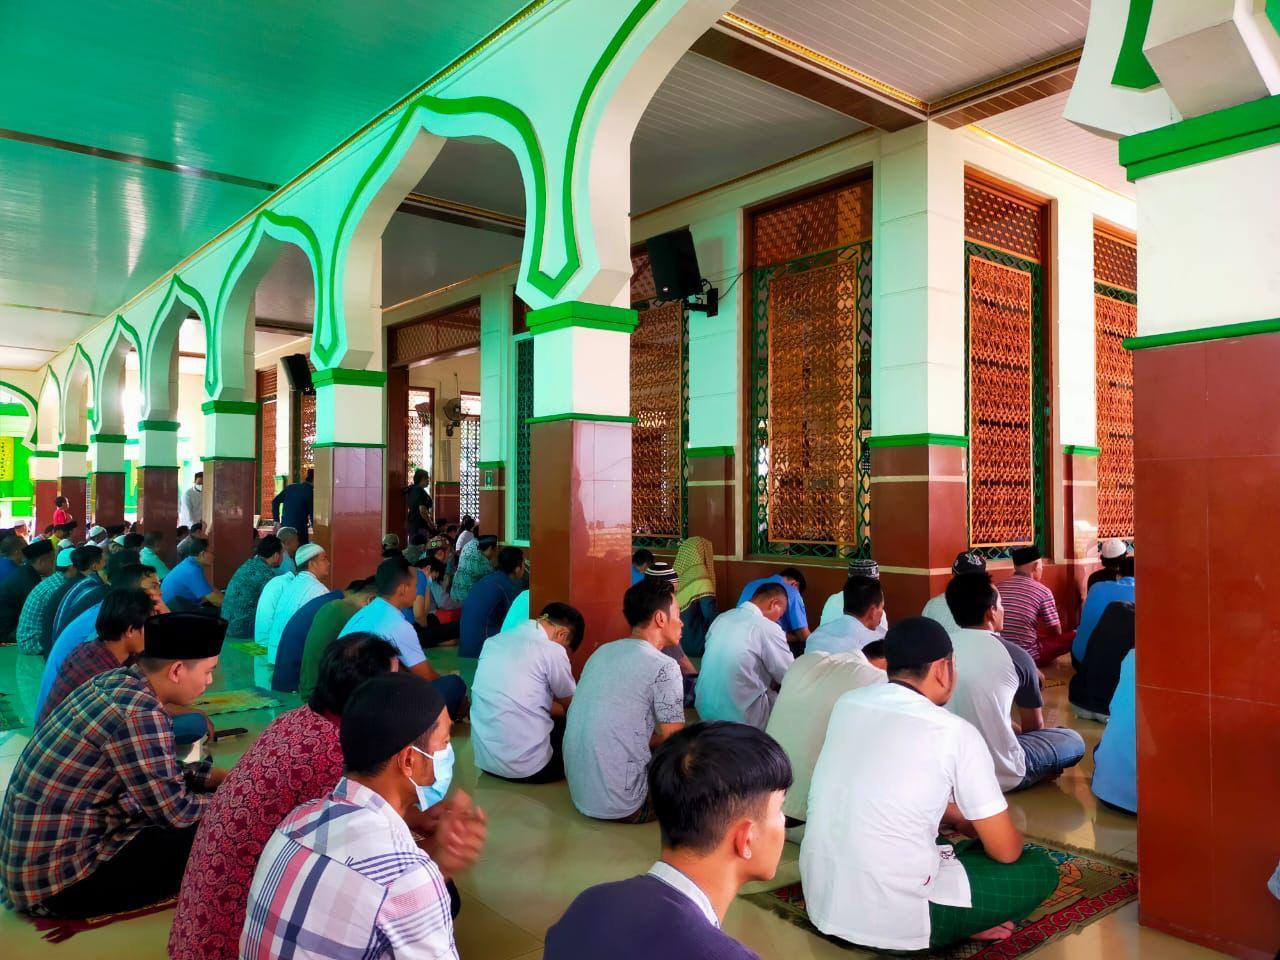 Suasana jamaah Masjid Jami Nurul Iman, Jatake, Kota Tangerang, Banten saat menjalani salat Jum'at.